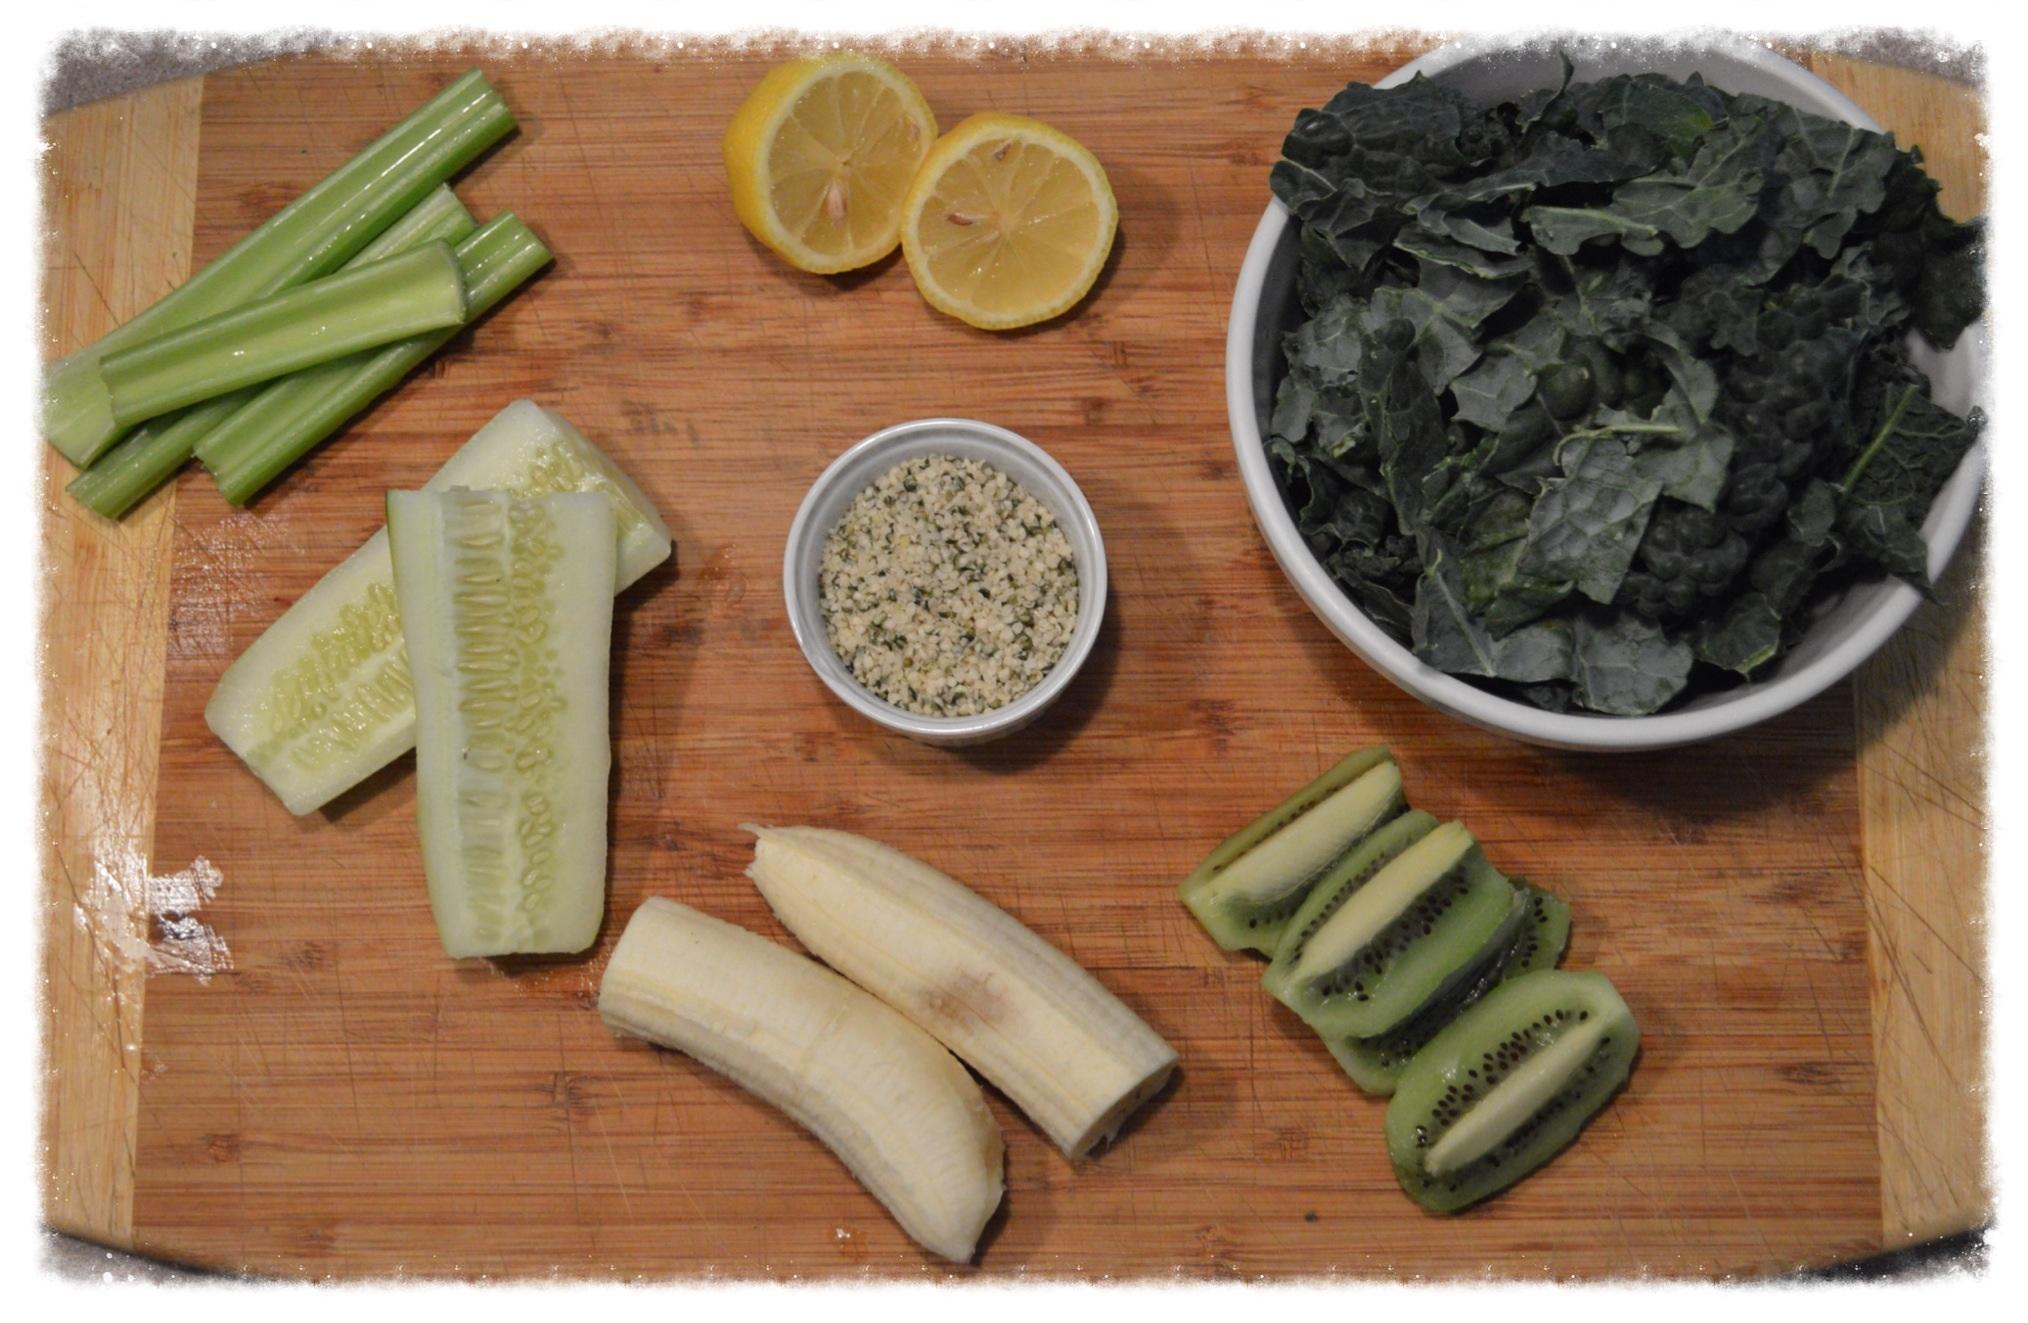 Kale Green Smoothie Ingredients